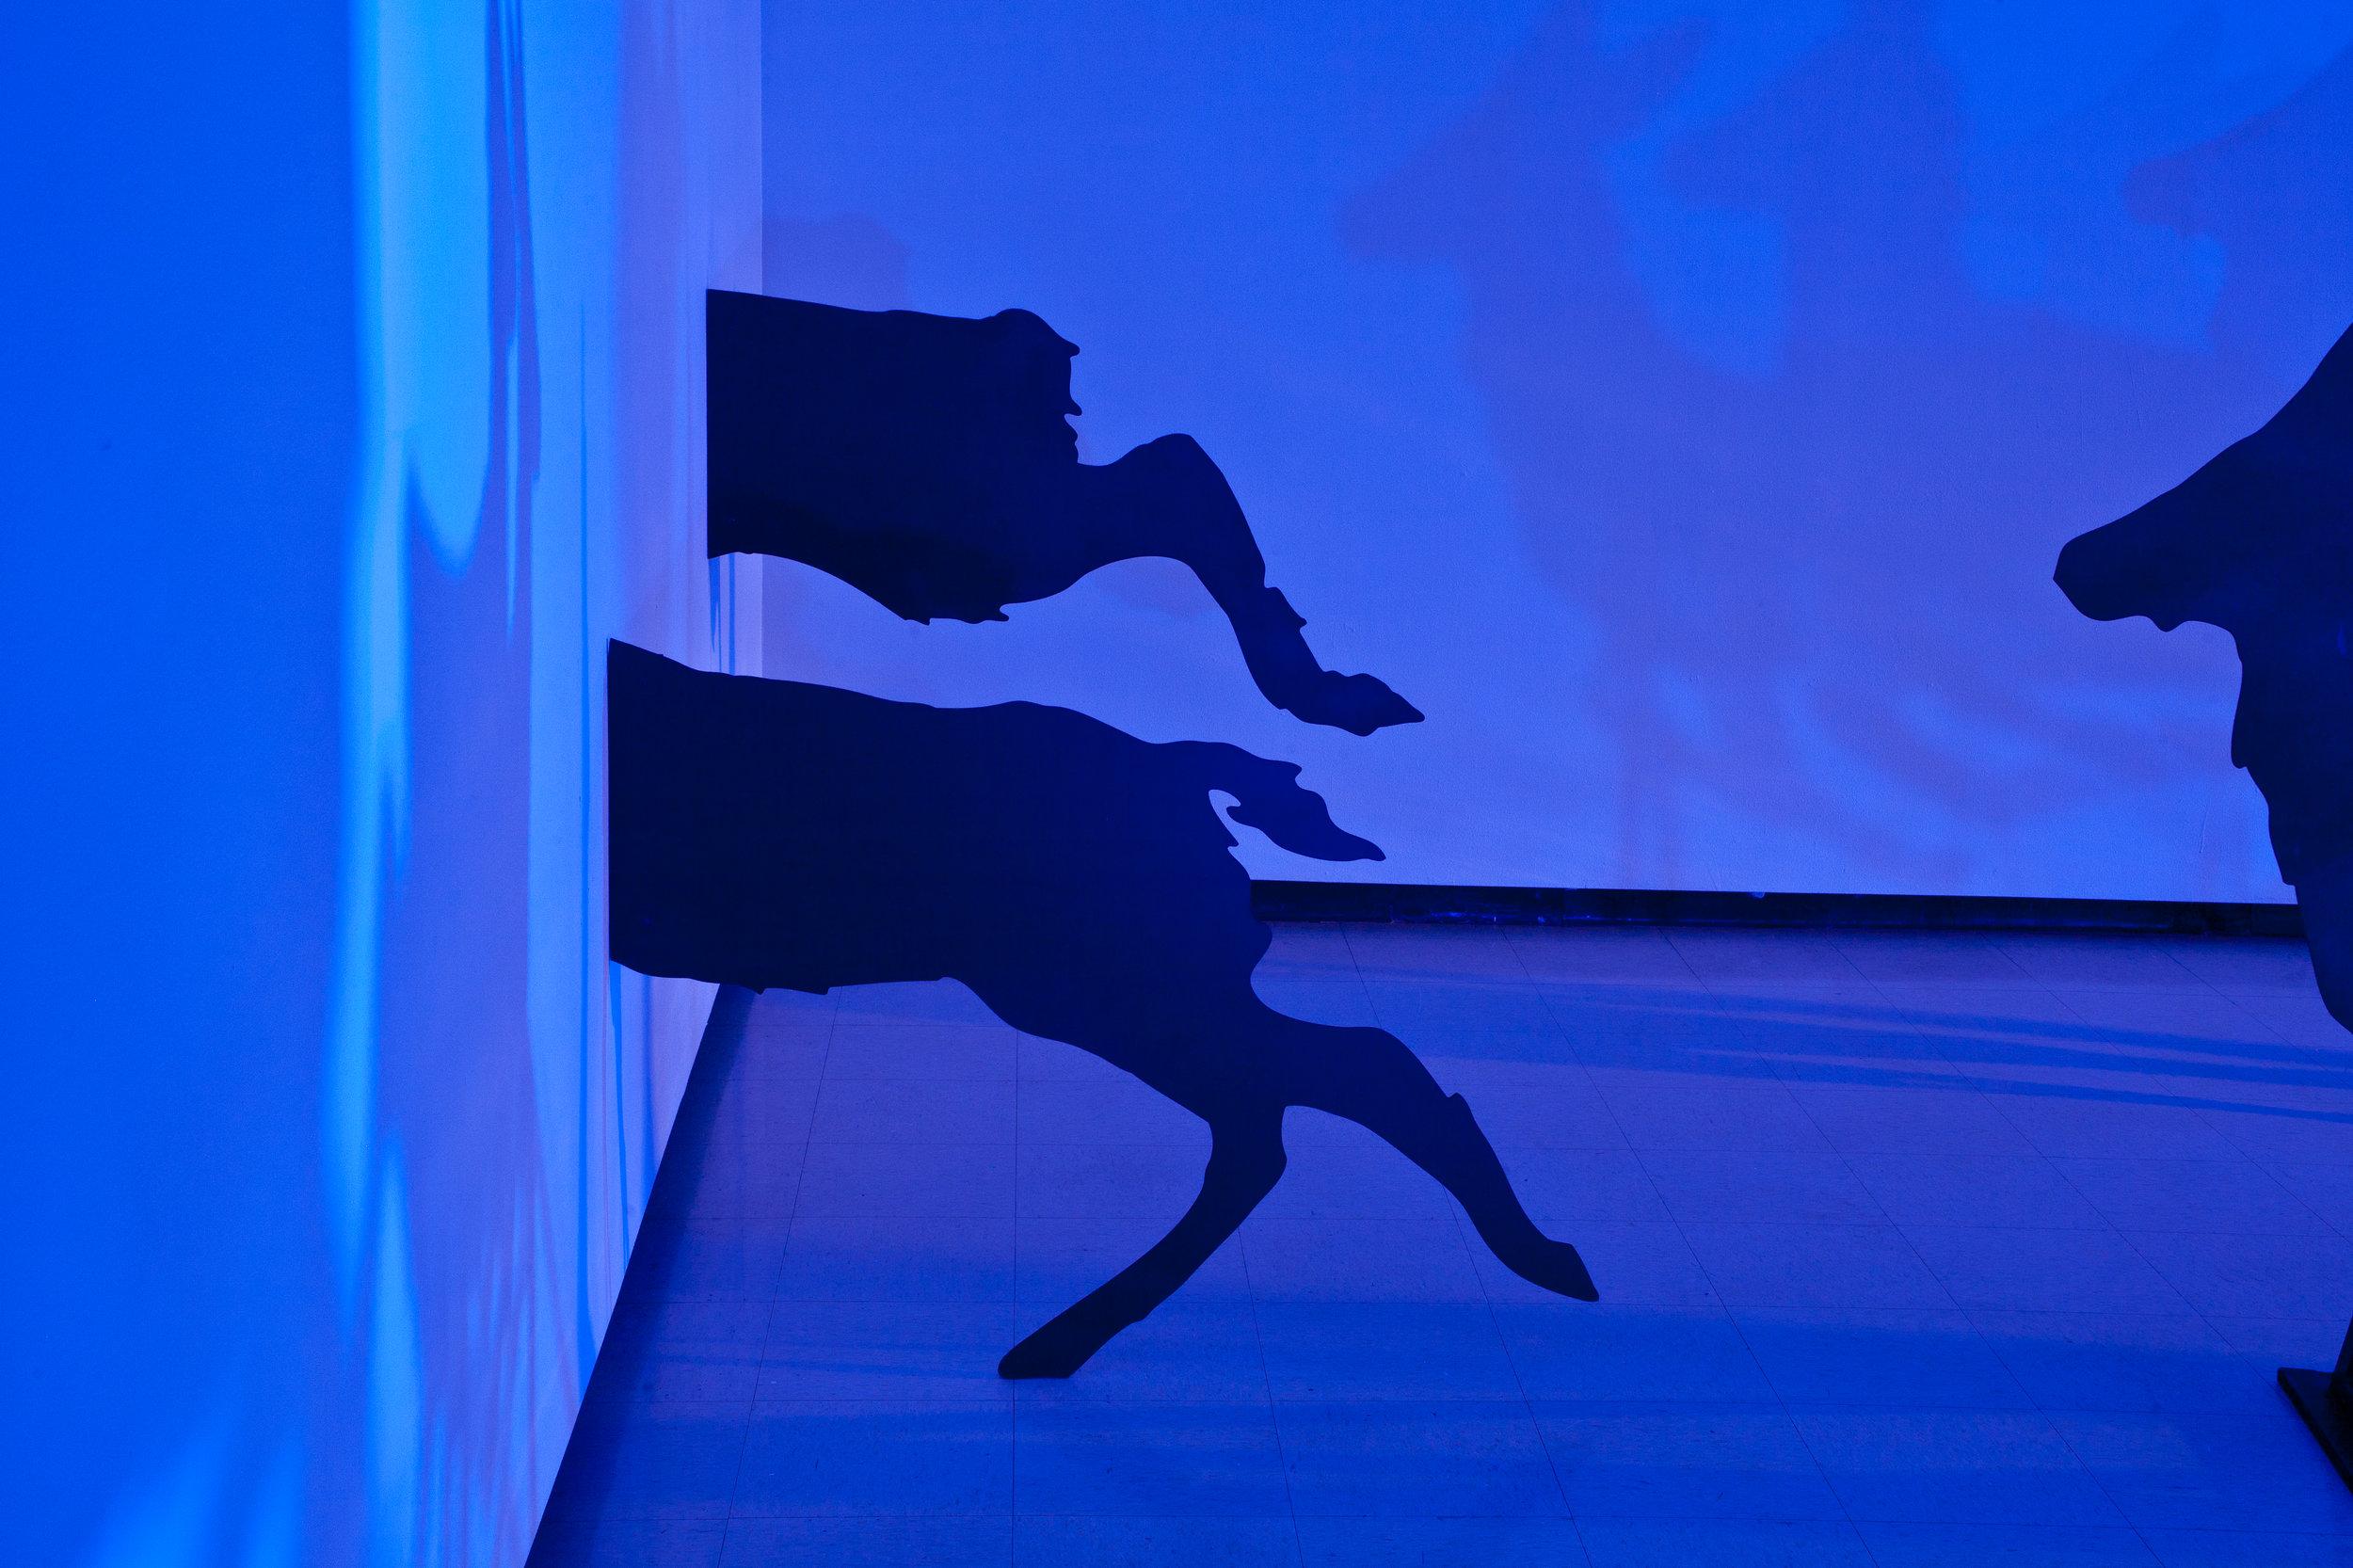 Encounter , Installation view:Harry Wood Gallery, Arizona State University, Tempe, Arizona, 2011  Photo Credit: Joshua White